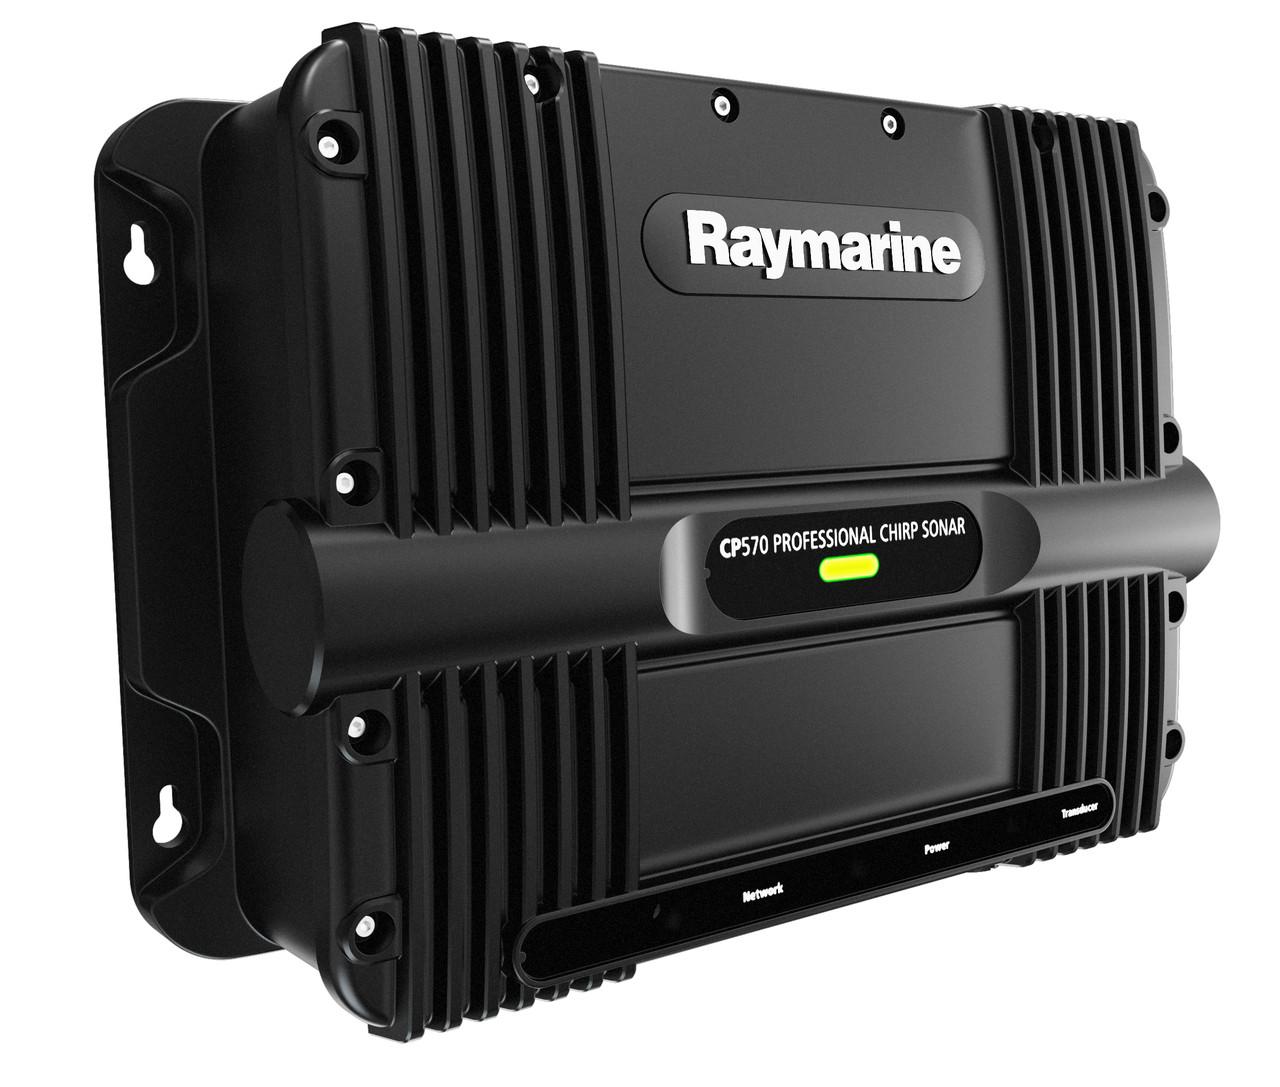 Raymarine CP570 ClearPulse Chirp Sonar Module Fishfinder Extreme Left View